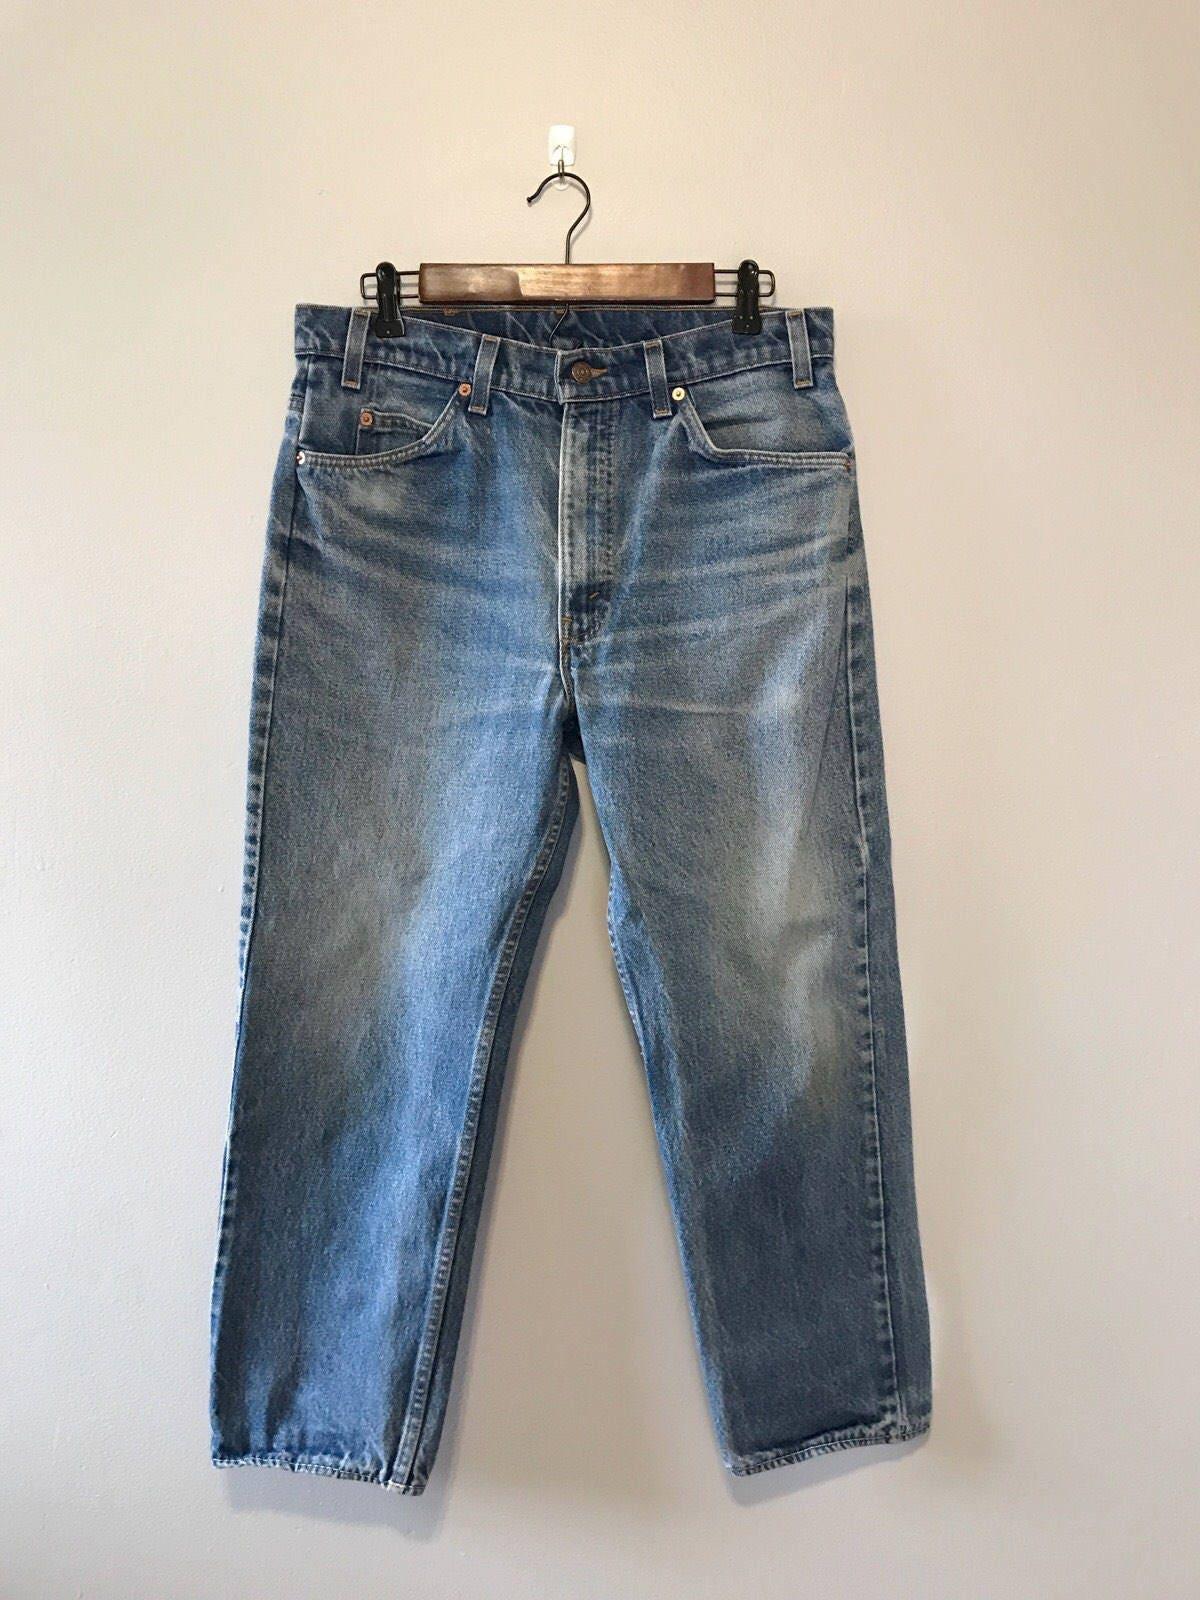 Orange tag levi jeans